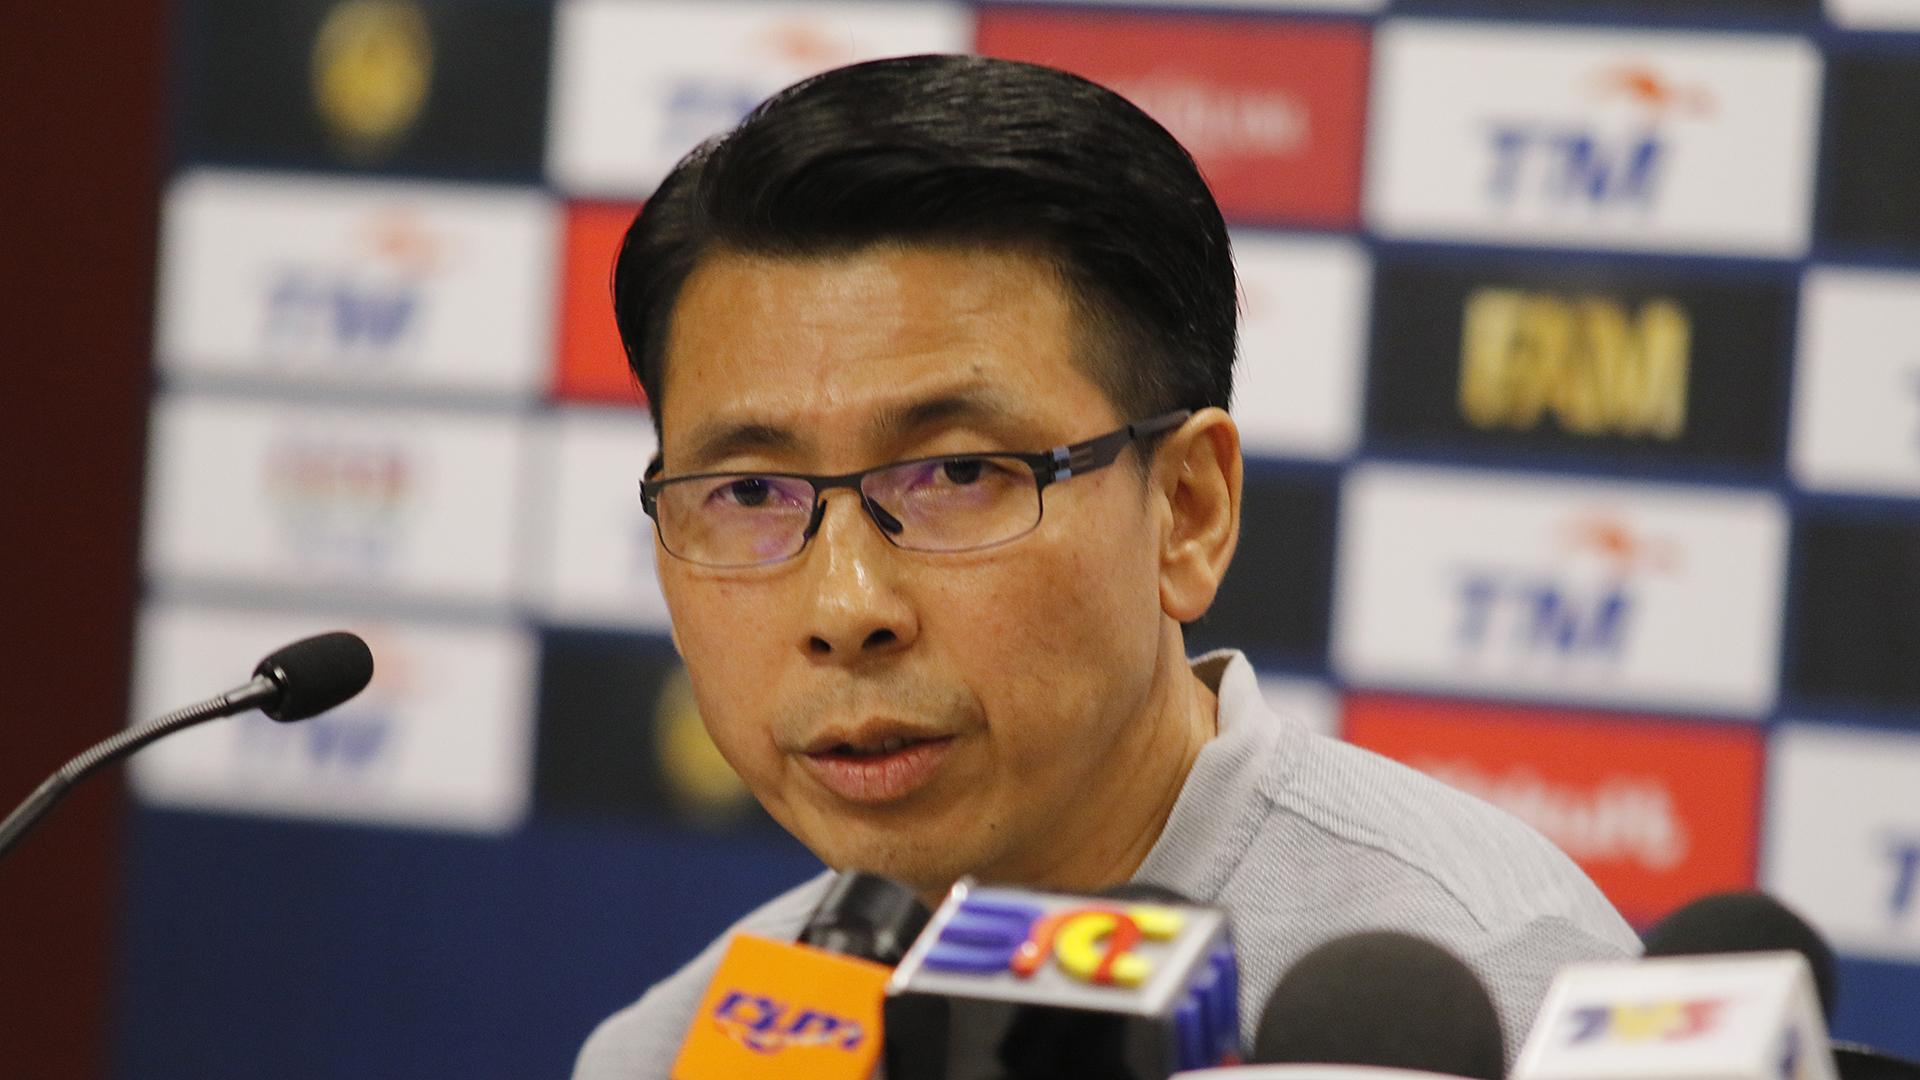 Tan Cheng Hoe, Malaysia v Nepal, 1 Jun 2019